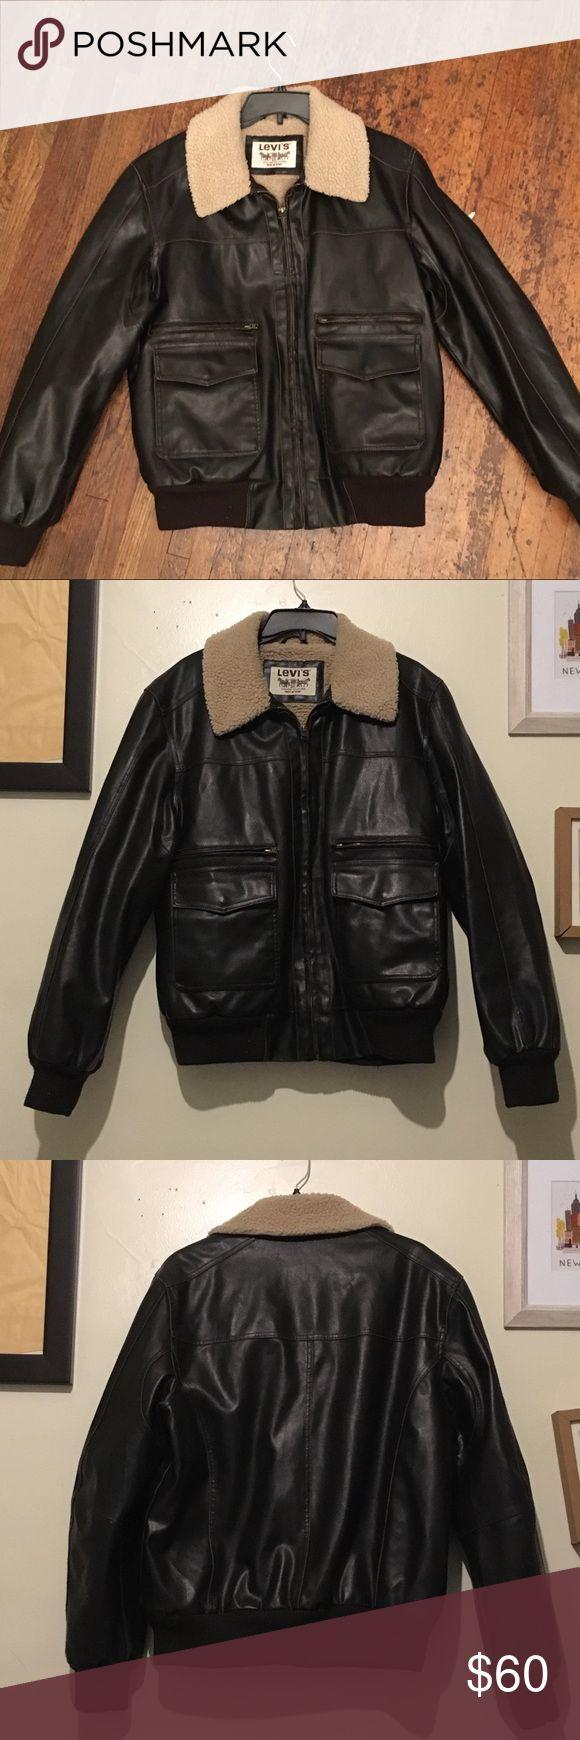 Men's Levi's Faux Leather Jacket  Men's Levi's Faux Leather Jacket, Size L  Super soft & warm inside, 4 exterior pockets, and 1 inside jacket pocket. The color is a dark chocolate brown. Levi's Jackets & Coats